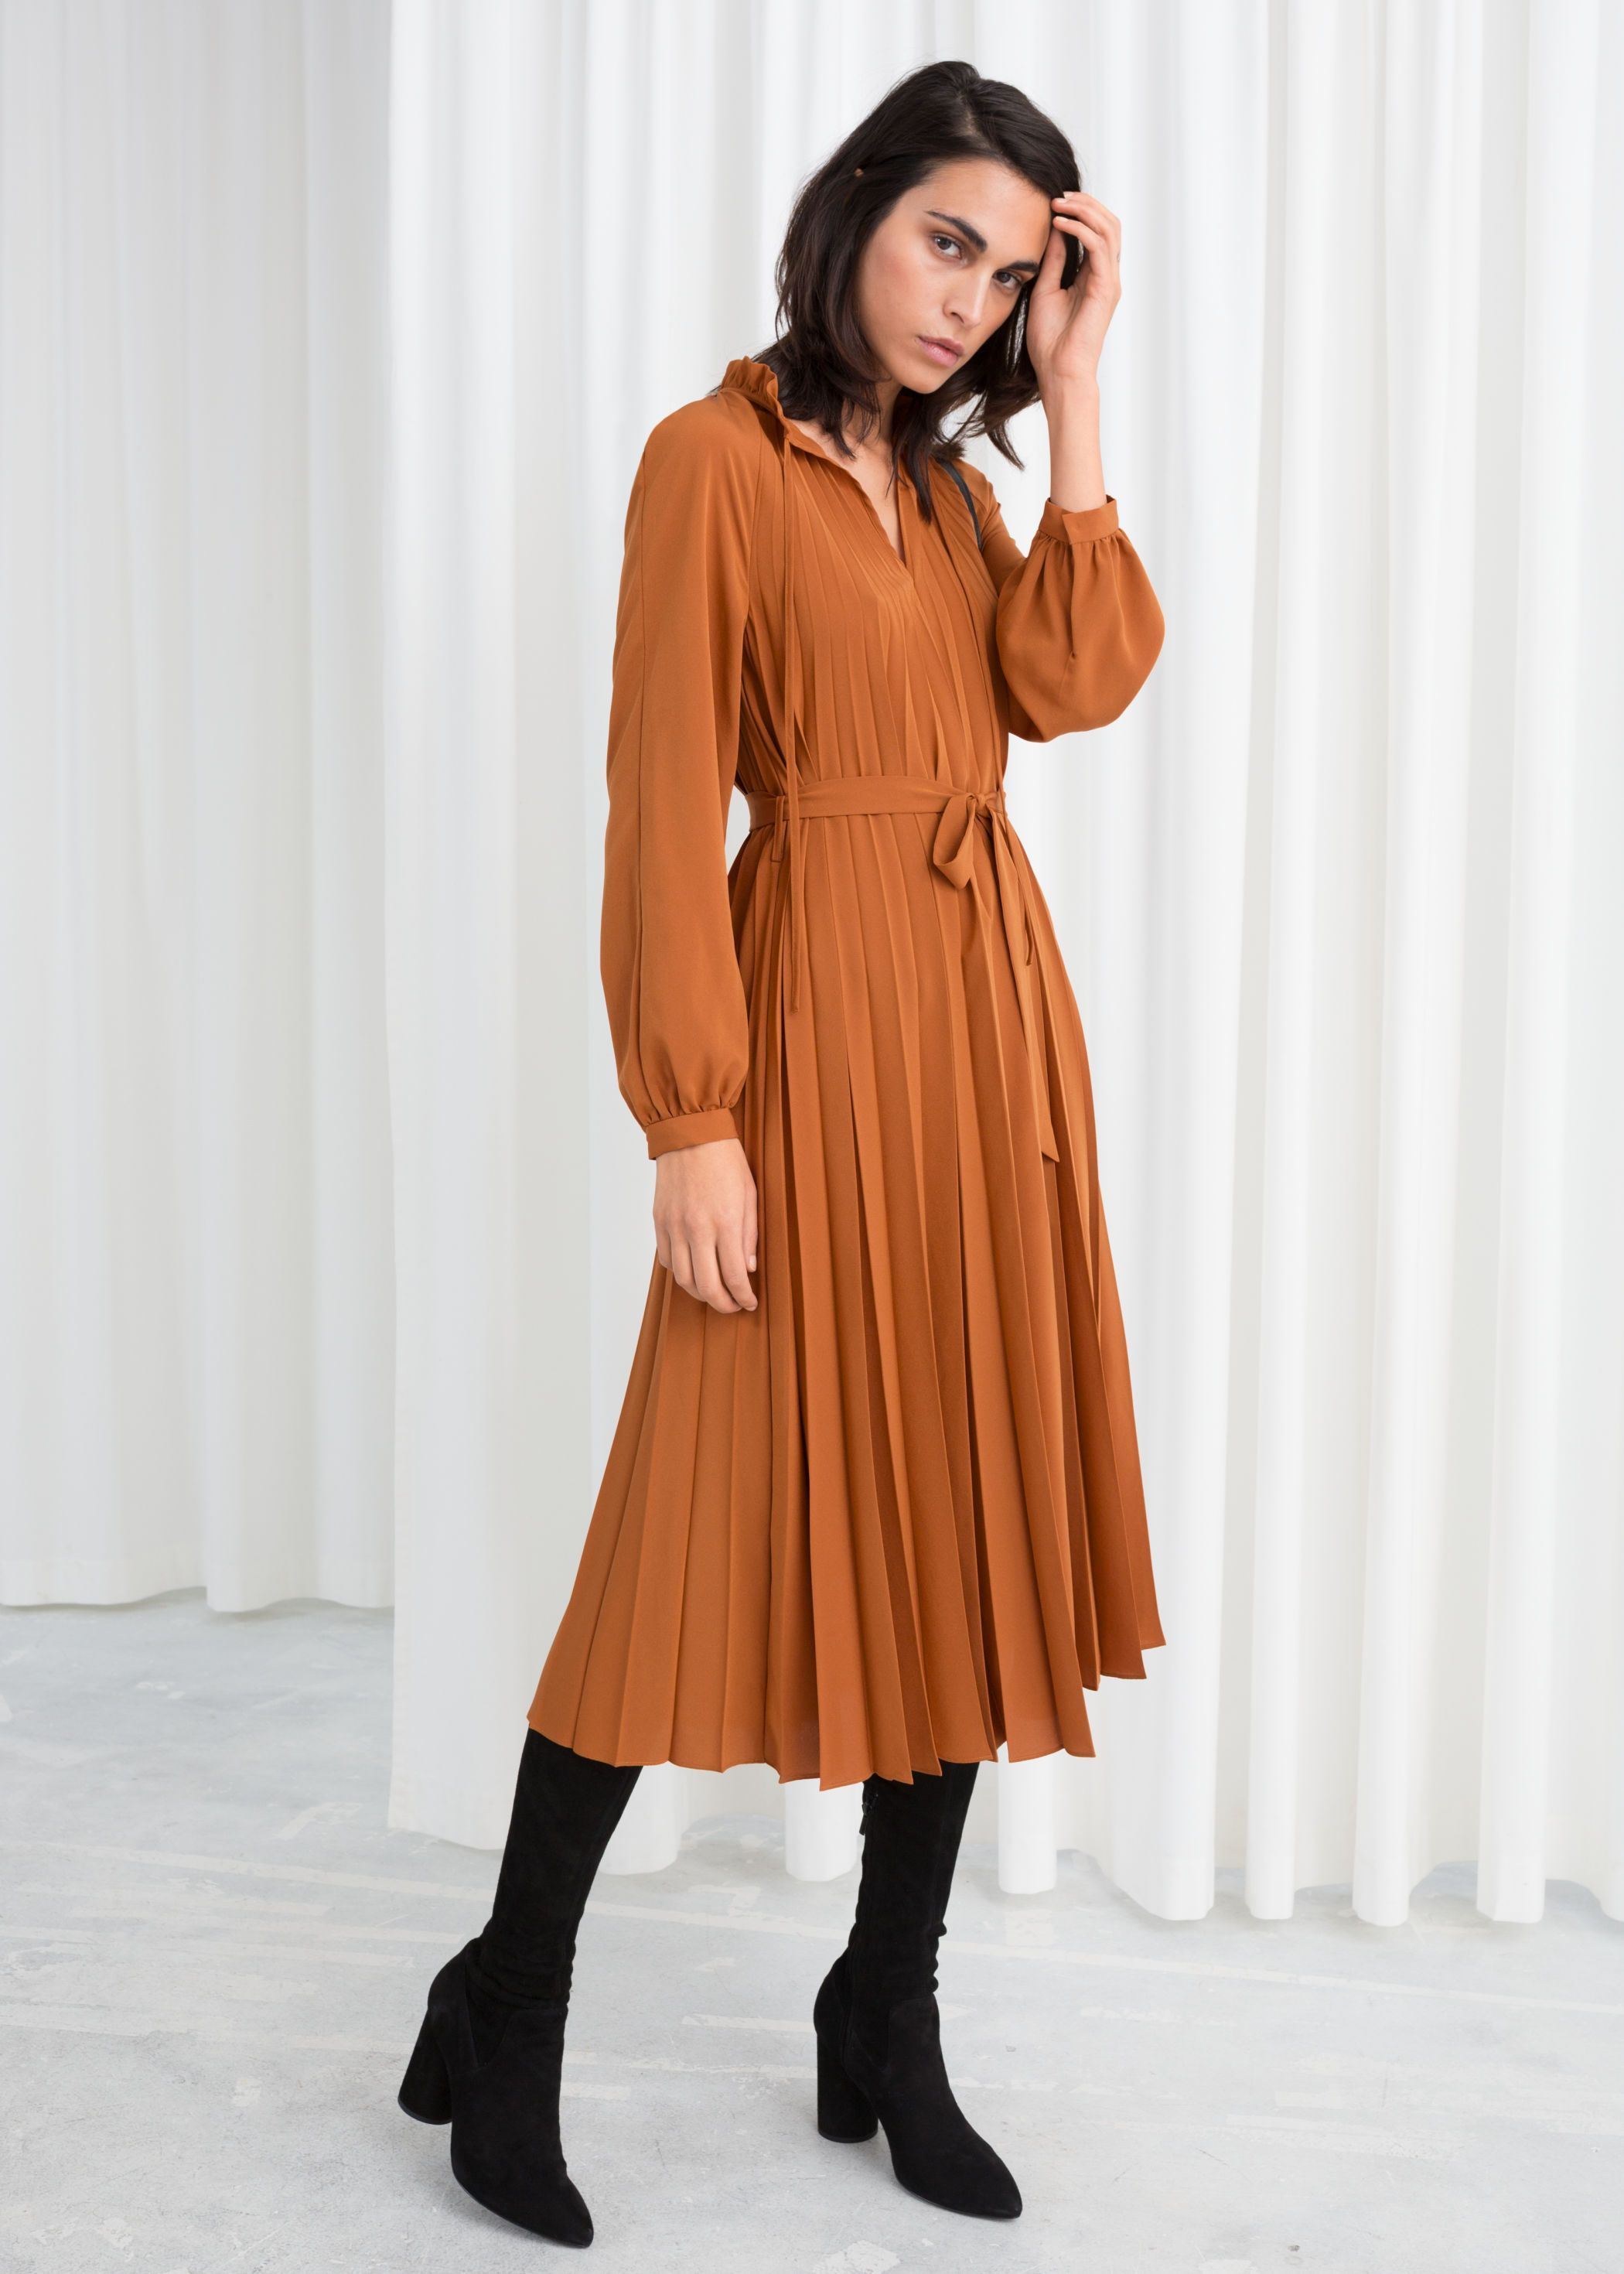 18 Long Sleeve Midi Dresses For Your Winter Wardrobe Consideration Pleated Midi Dress Midi Dress Winter Fashion [ 2940 x 2100 Pixel ]